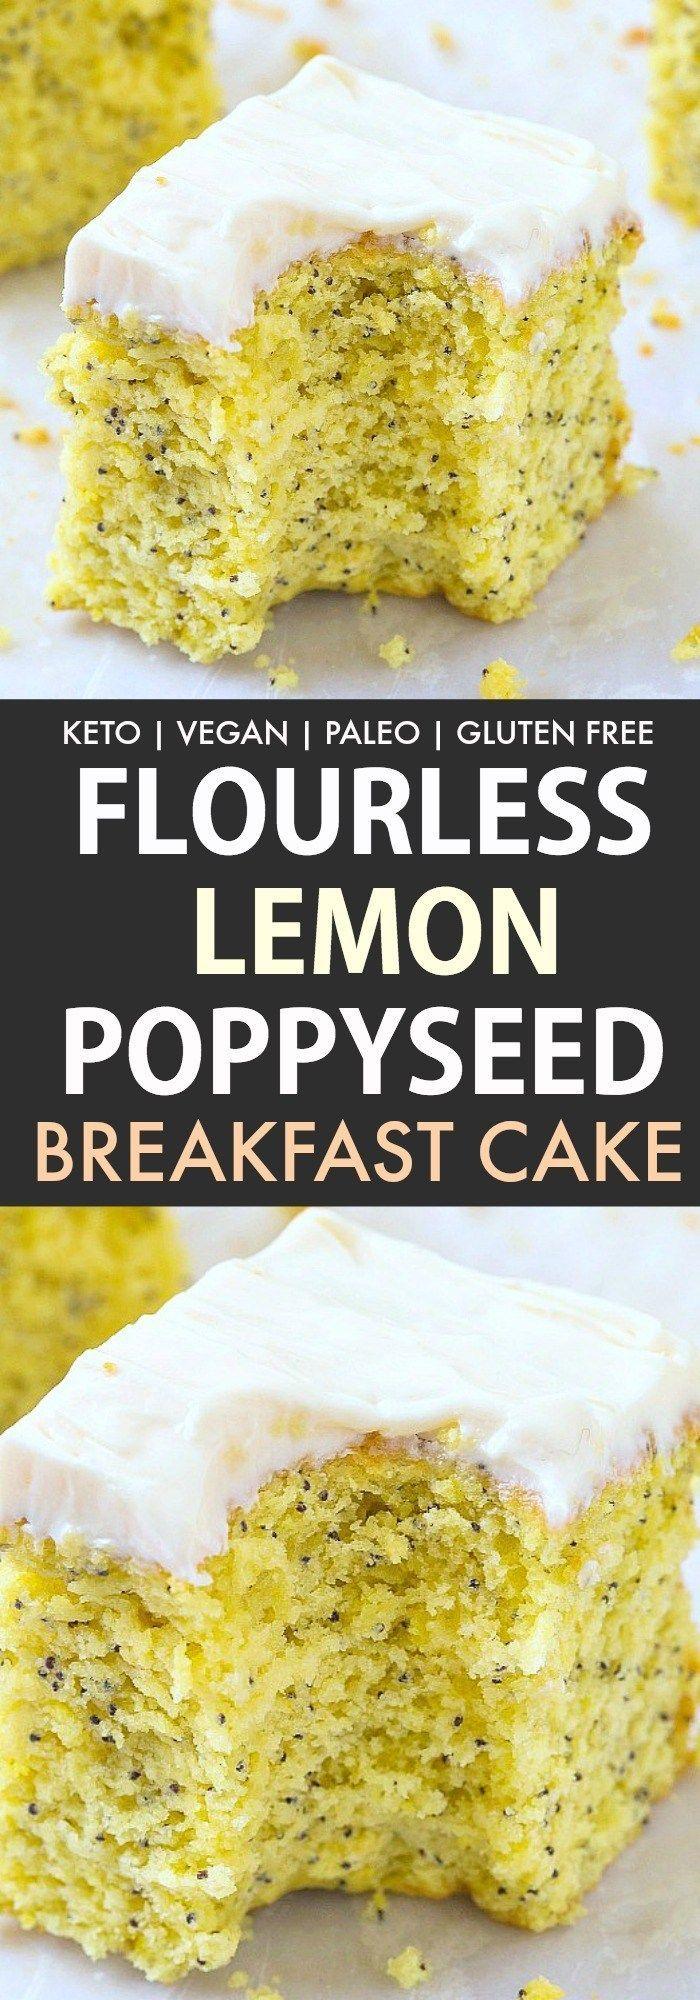 Photo of Healthy Flourless Lemon Poppy Seed Breakfast Cake